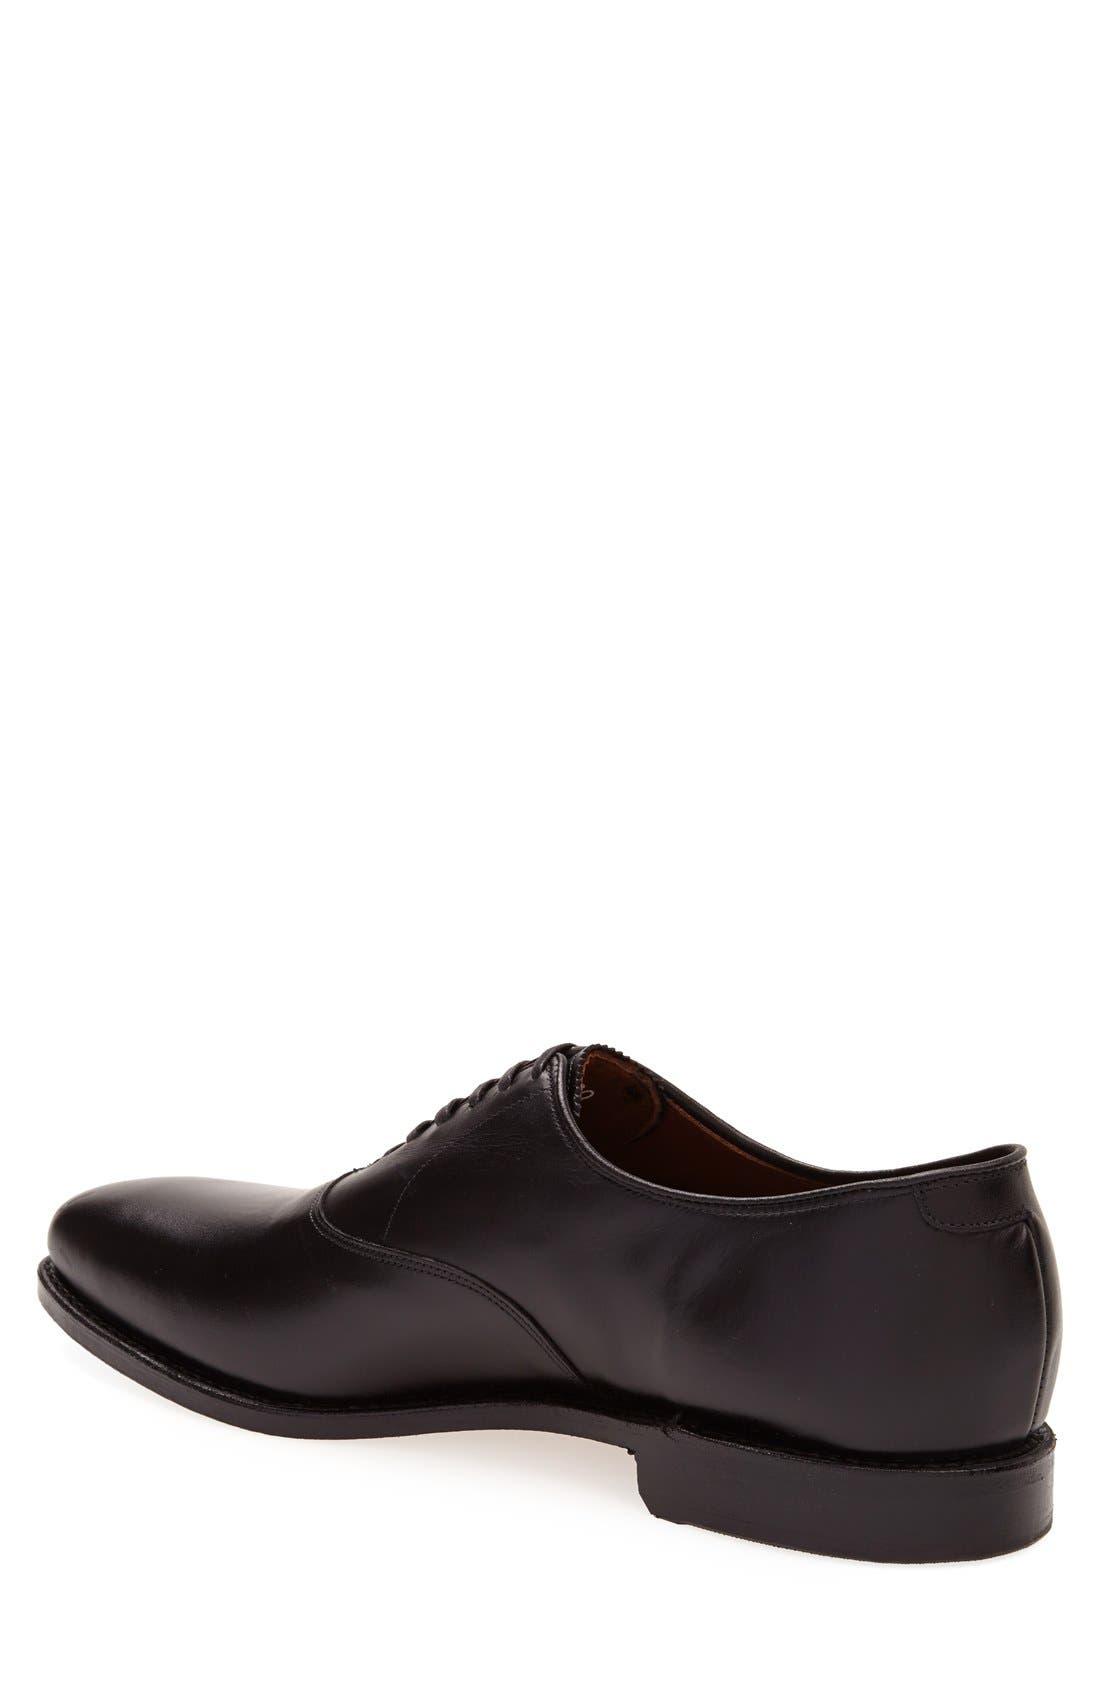 Carlyle Plain Toe Oxford,                             Alternate thumbnail 2, color,                             Black Leather